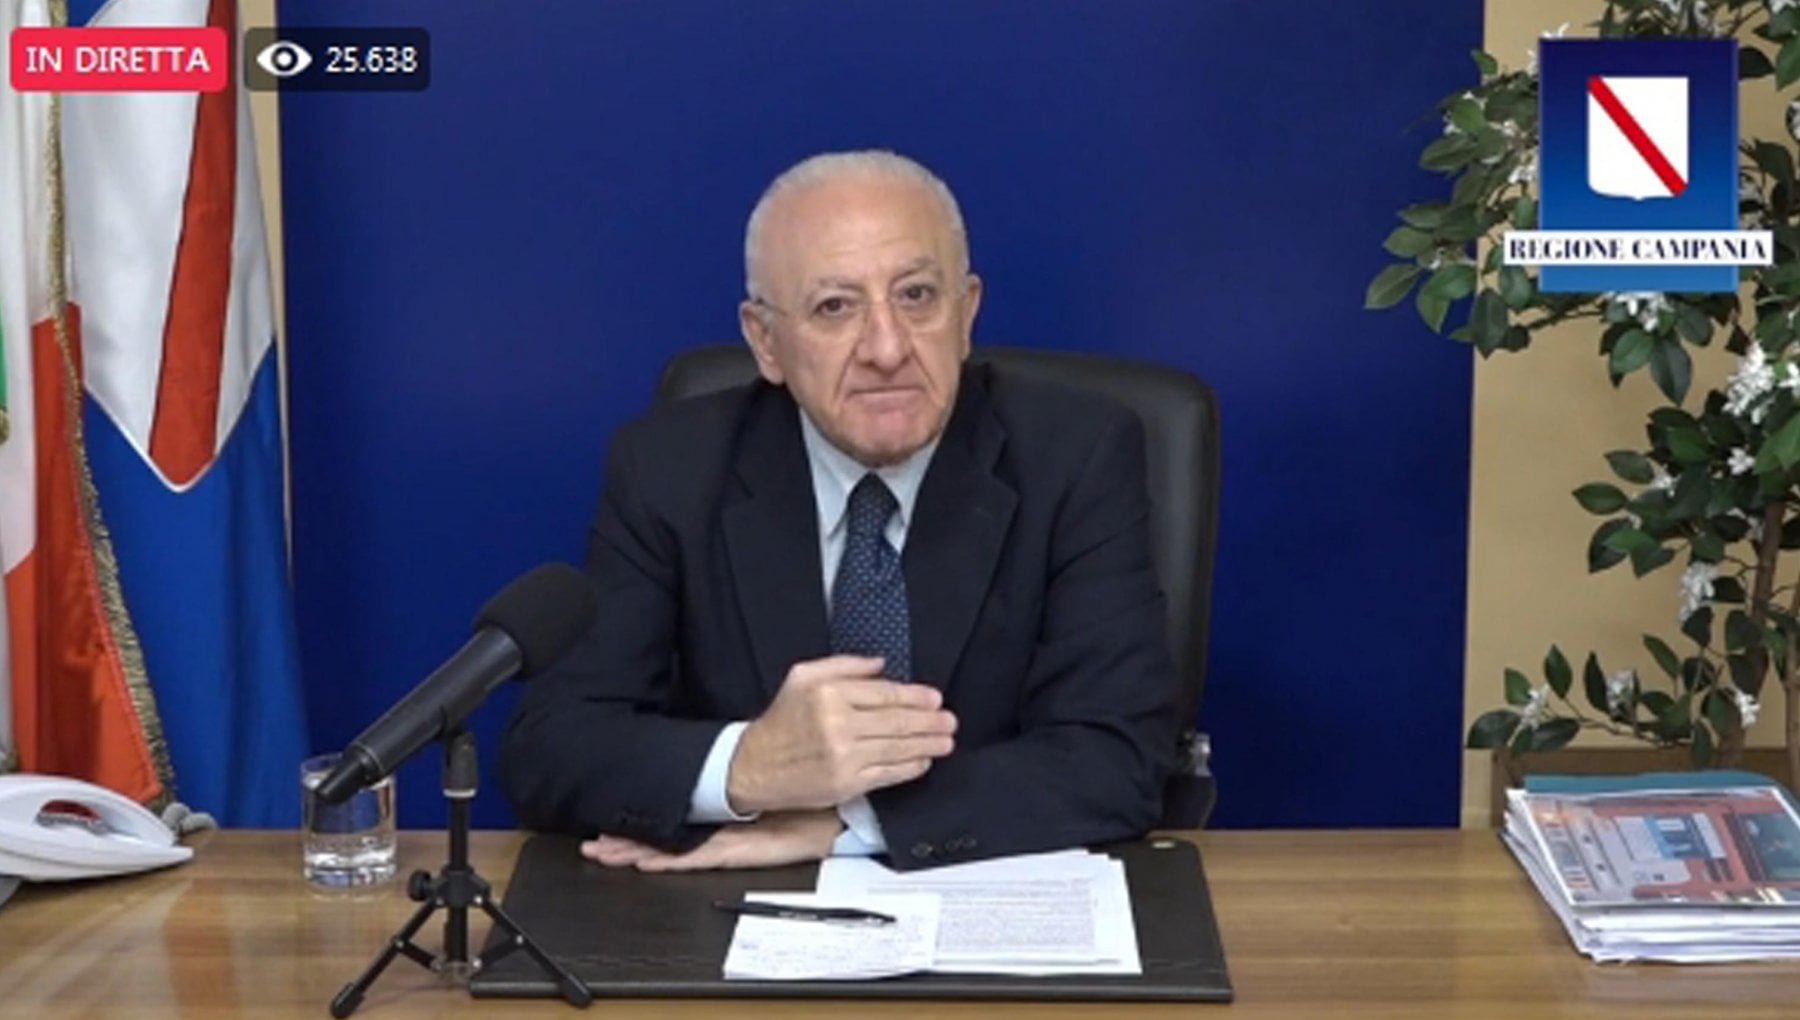 Autisti promossi in Regione De Luca risarcisca 403 mila euro